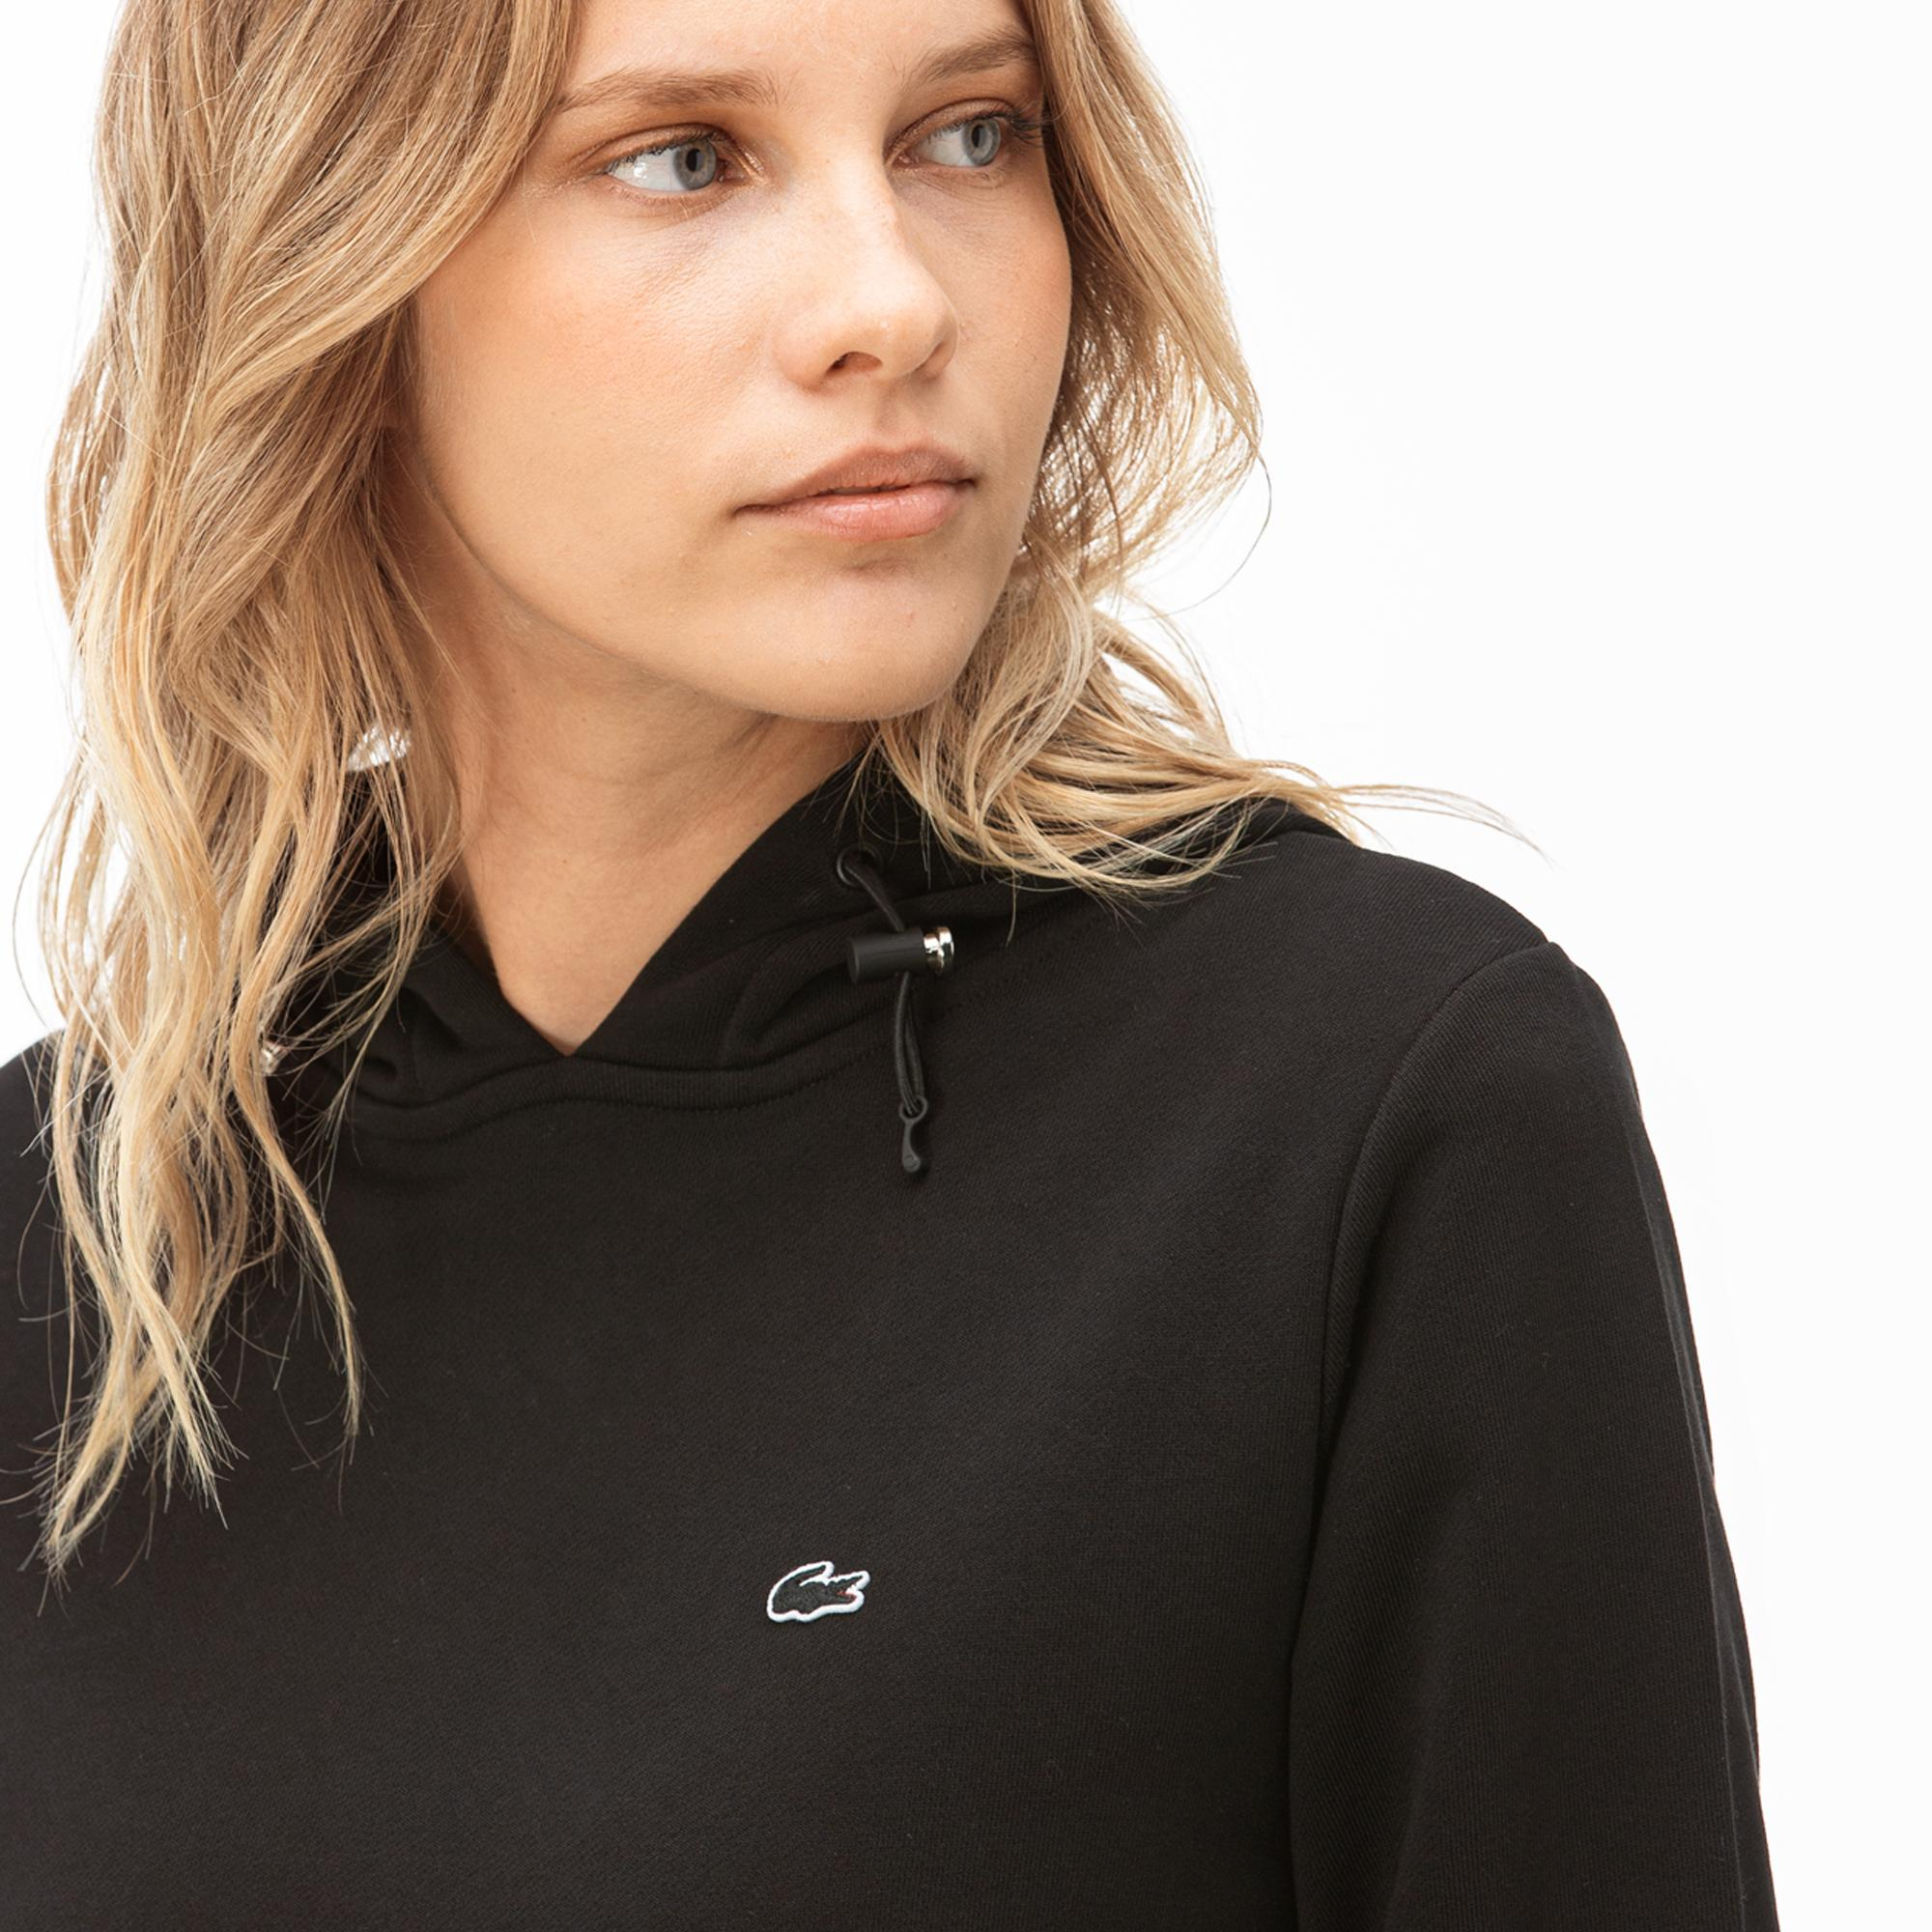 Lacoste Kadın Kapüşonlu Siyah Sweatshirt